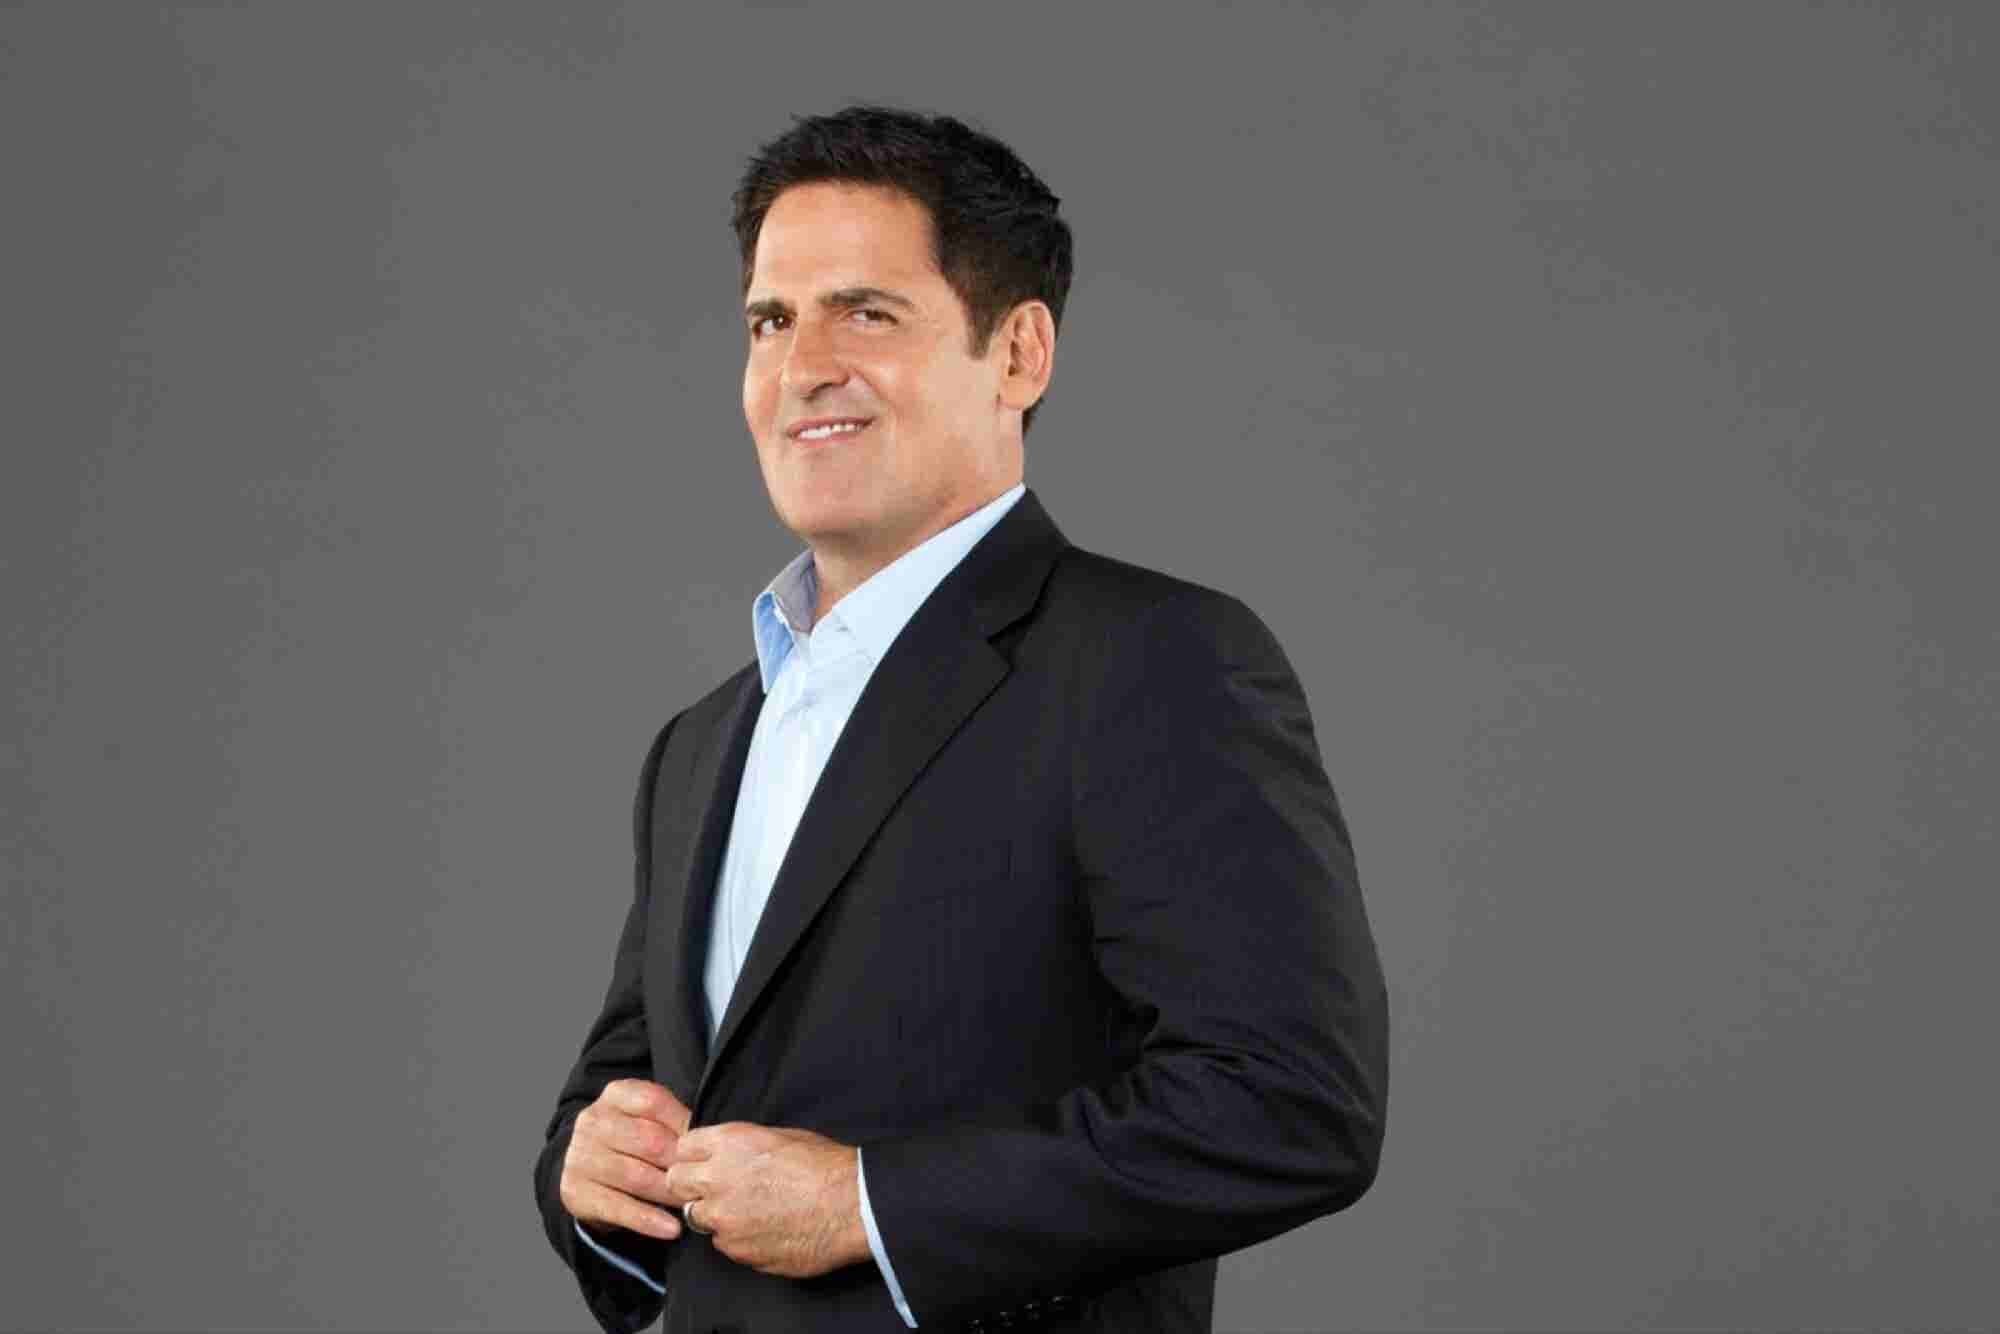 Billionaire Mark Cuban on Raising Kids: 'I Don't Want Them to Be Entitled Jerks'